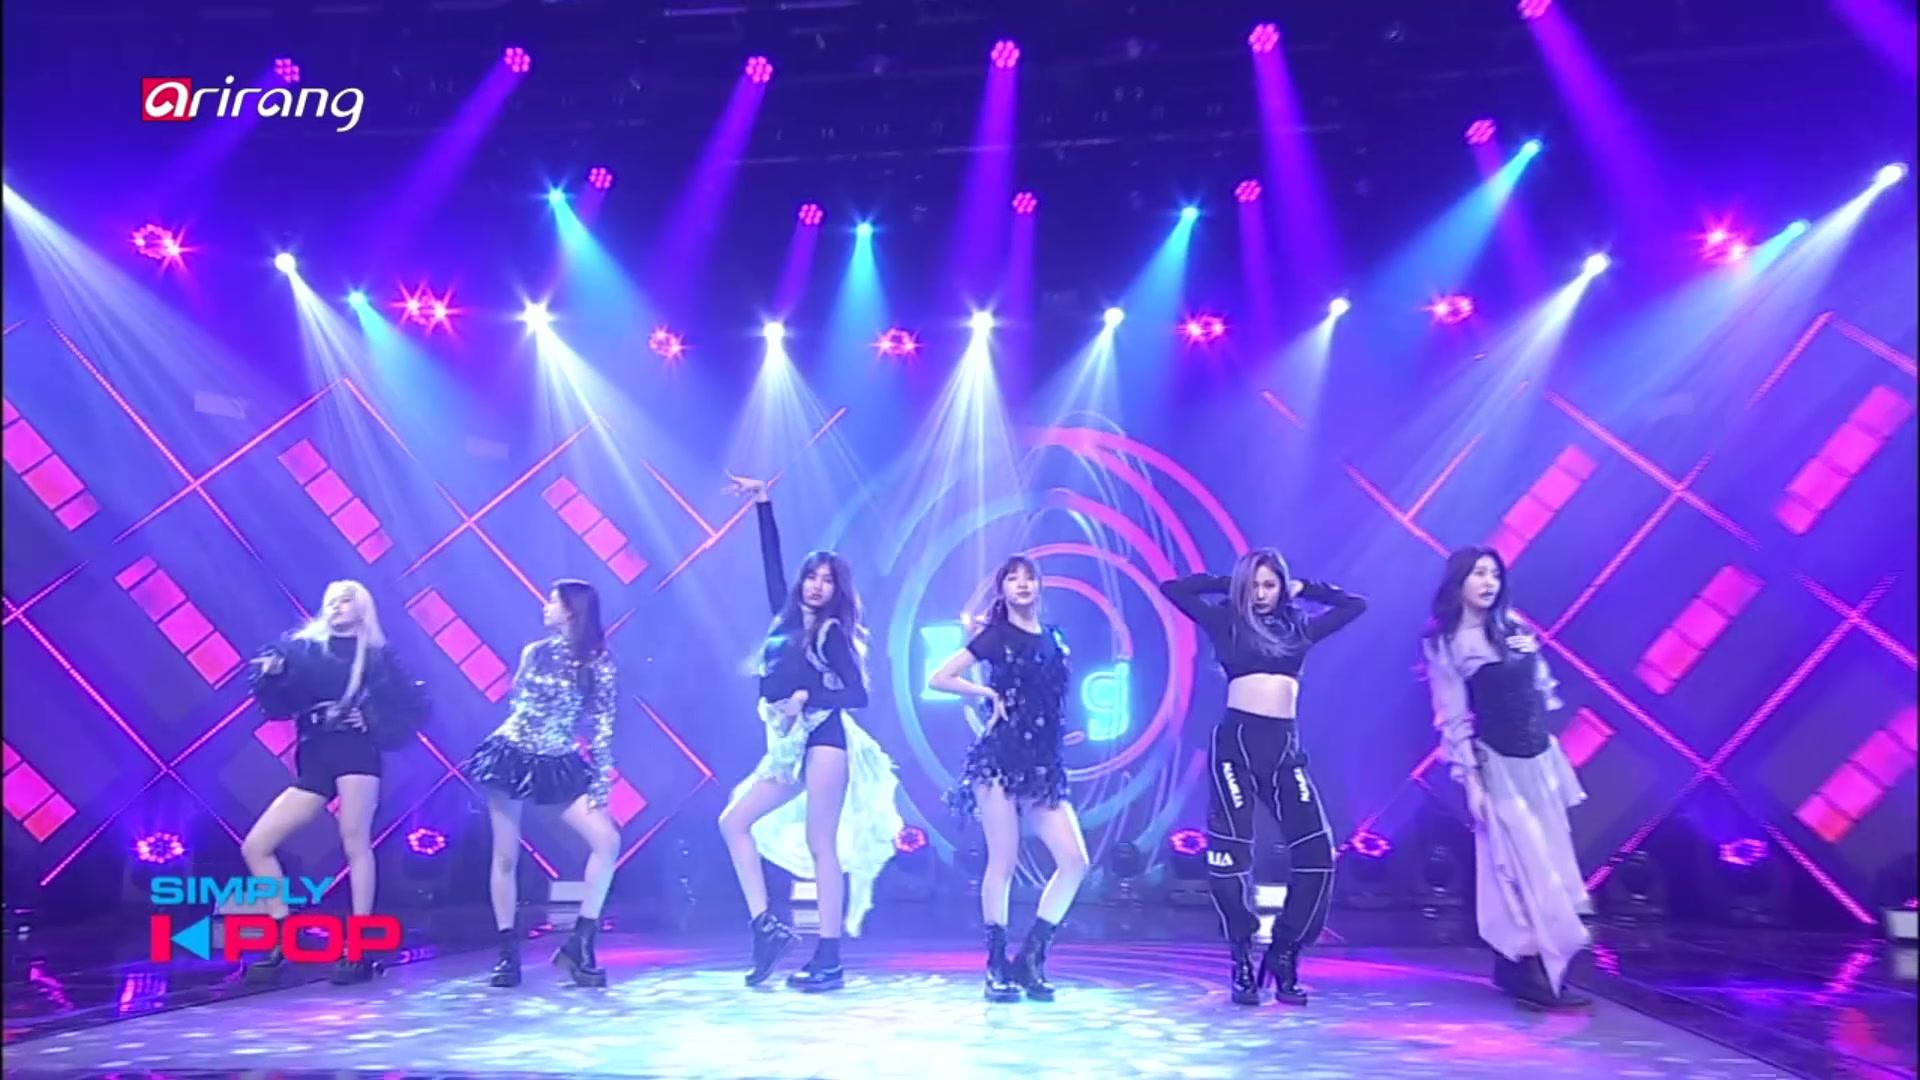 Simply K-pop Episode 354